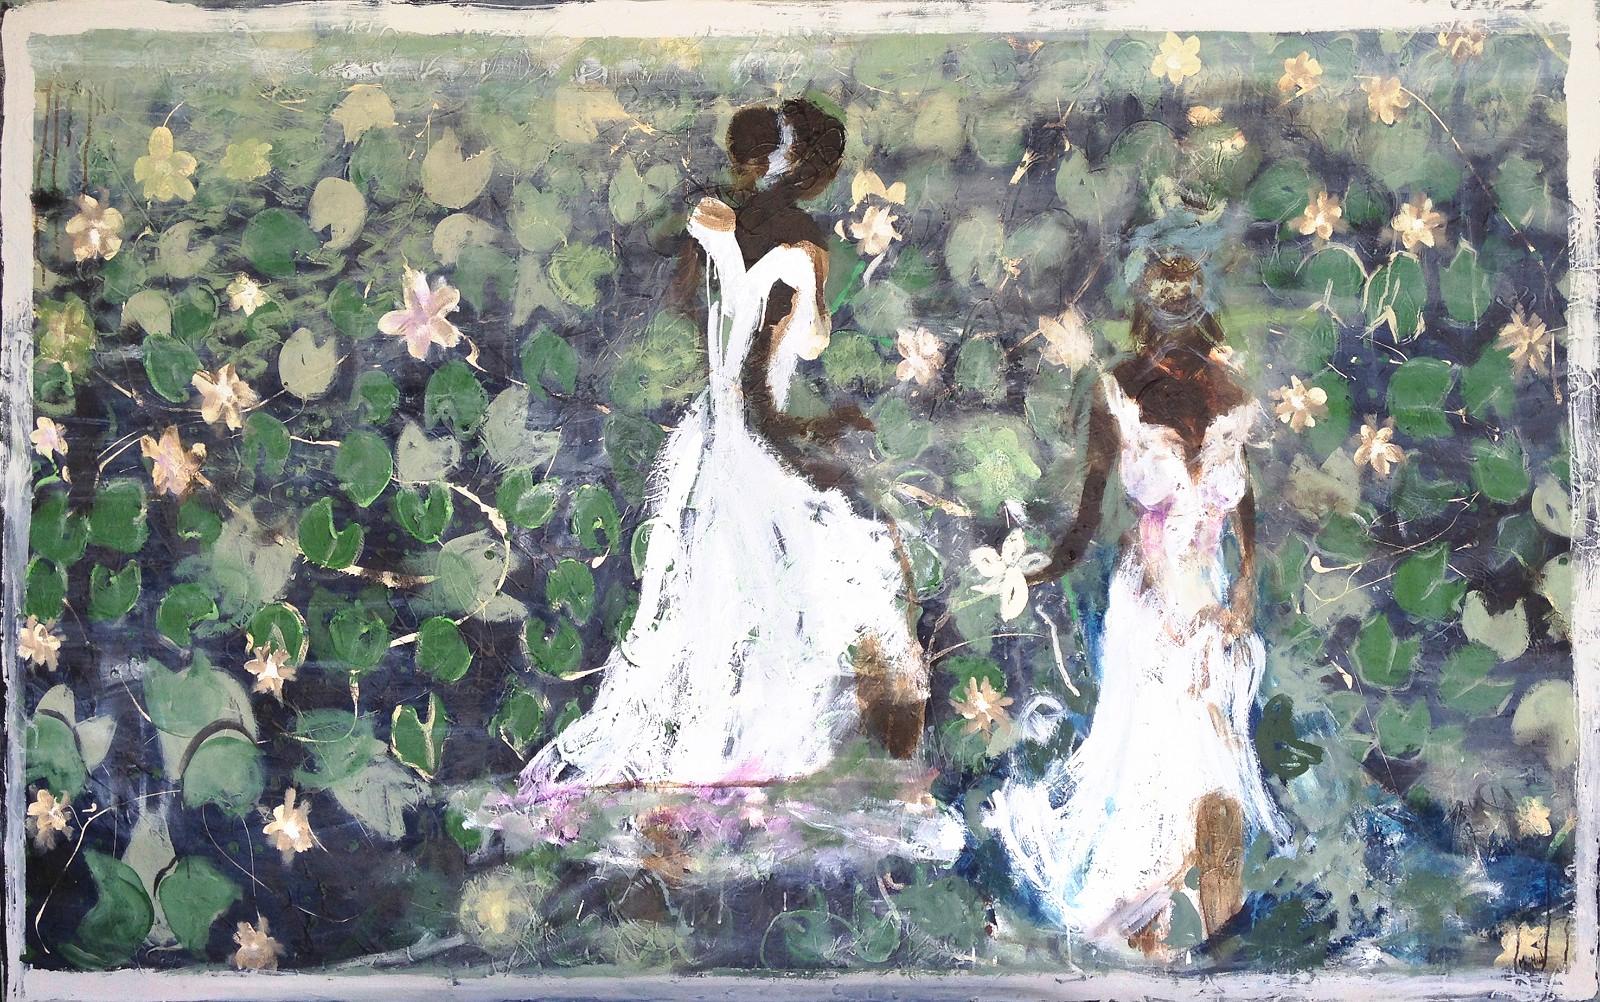 John Maitland 'Field of Lilies' 150cm x 236cm